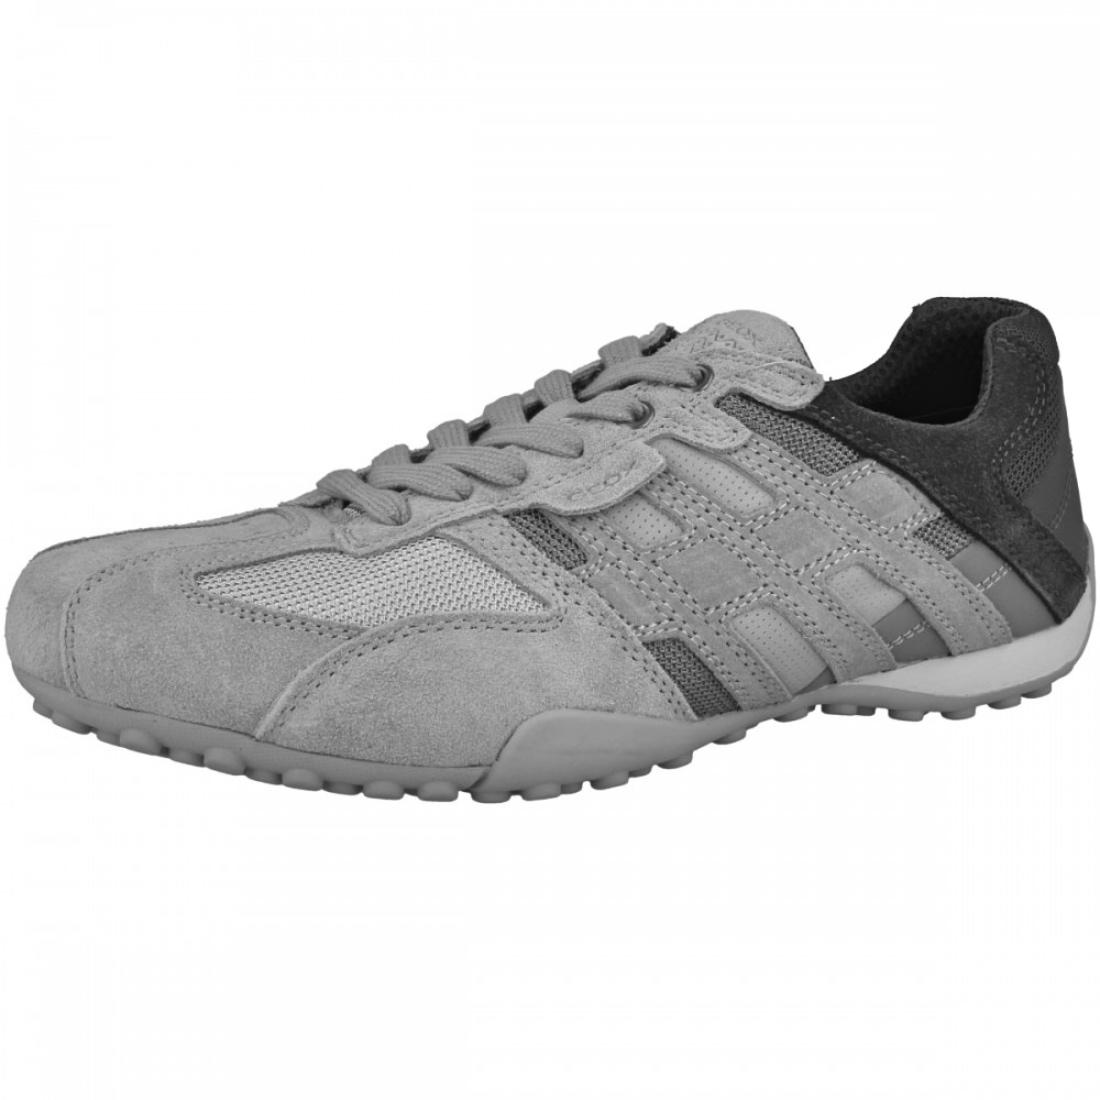 Geox RESPIRA Uomo Snake e Sneakers da Uomo Scarpe Basse u8207e c1415 Grey  Stone 5985cd6076a